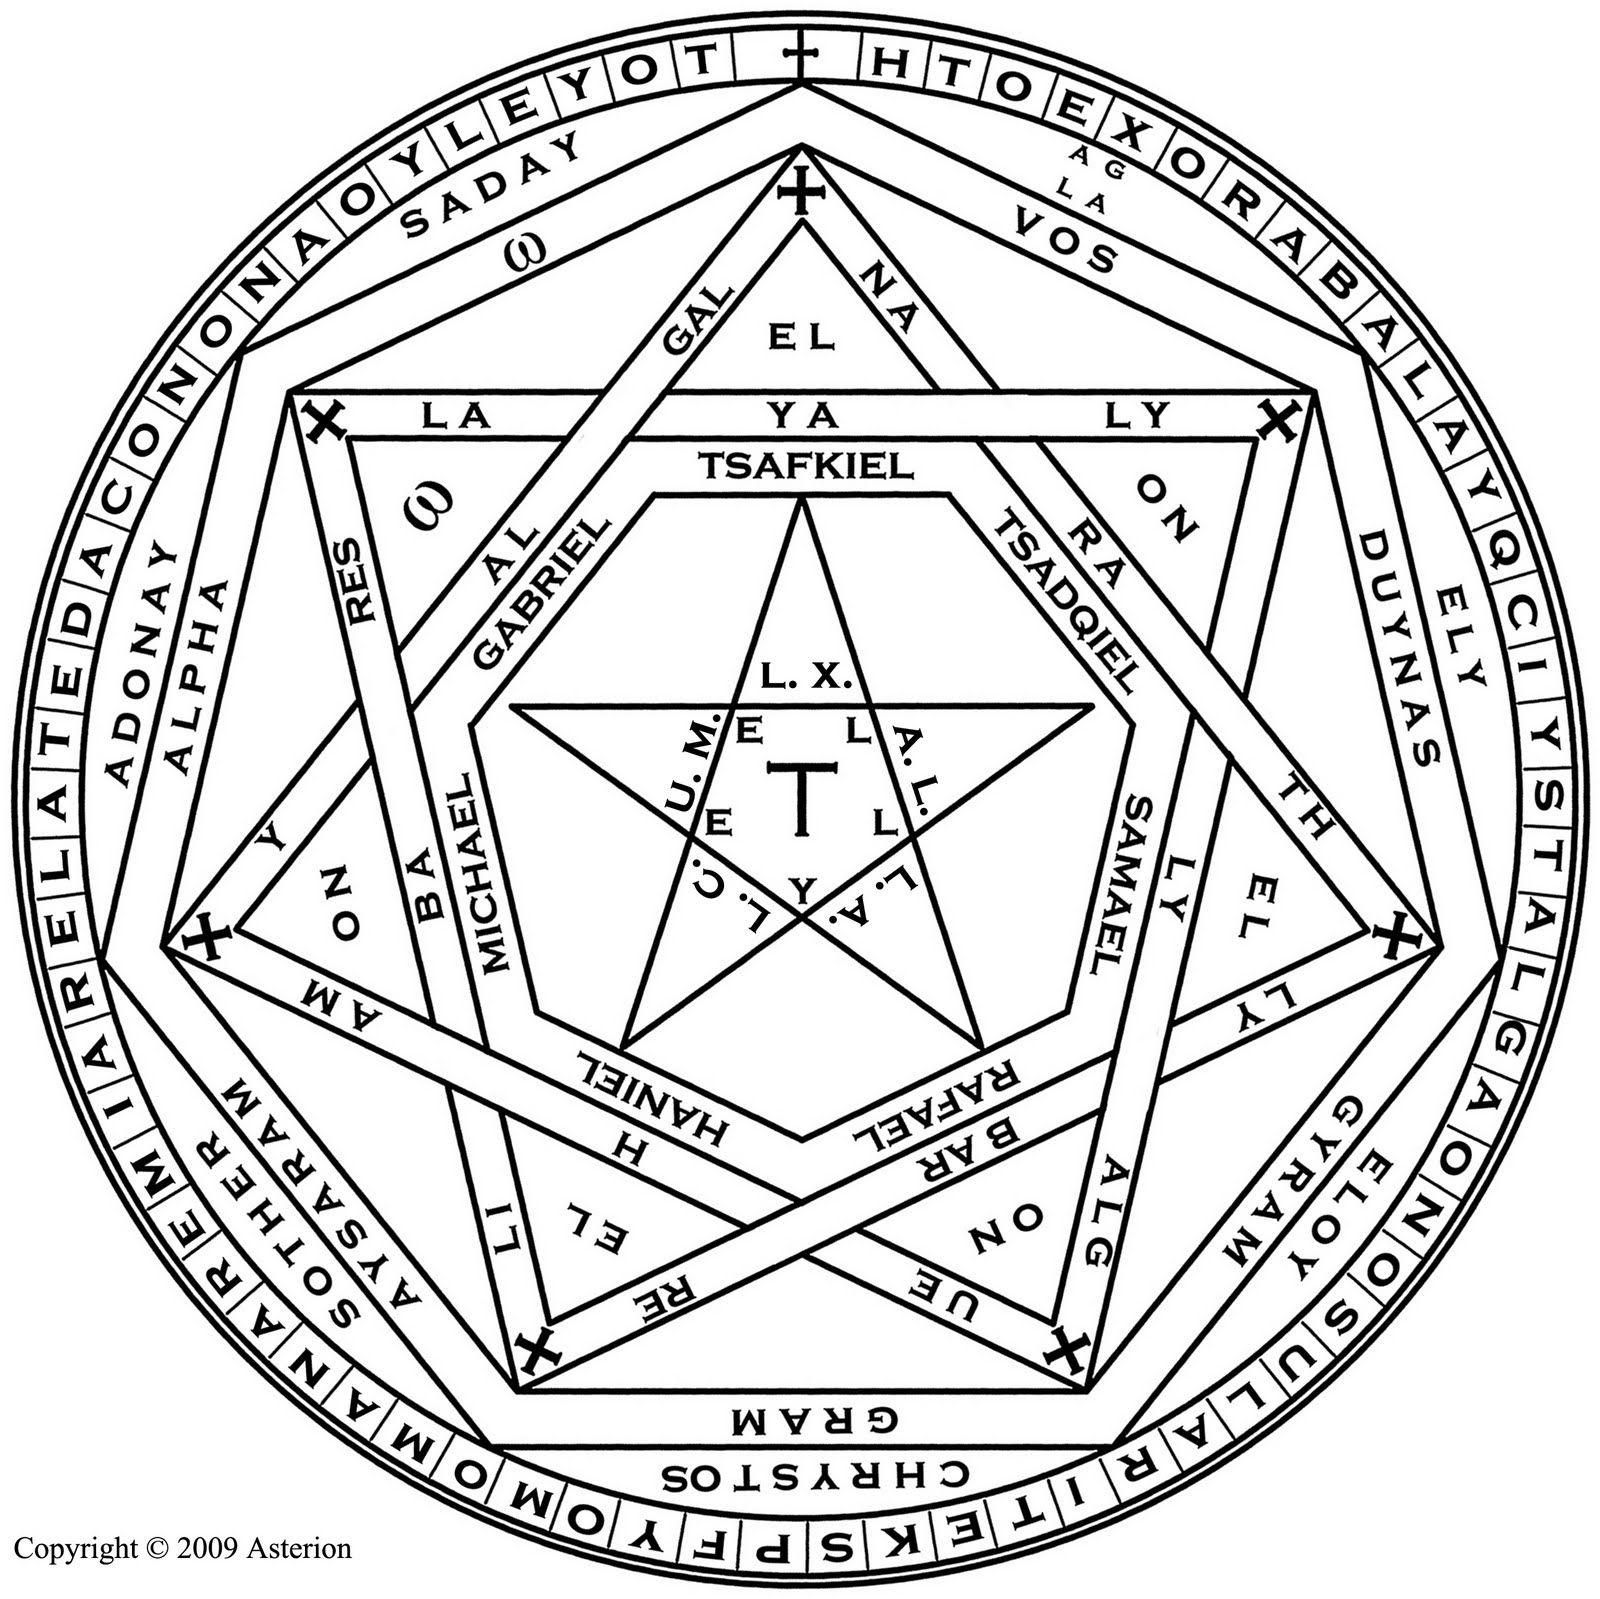 Occult random pinterest occult symbols and demonology occult the occultoccult artmystic symbolsinspiring biocorpaavc Choice Image